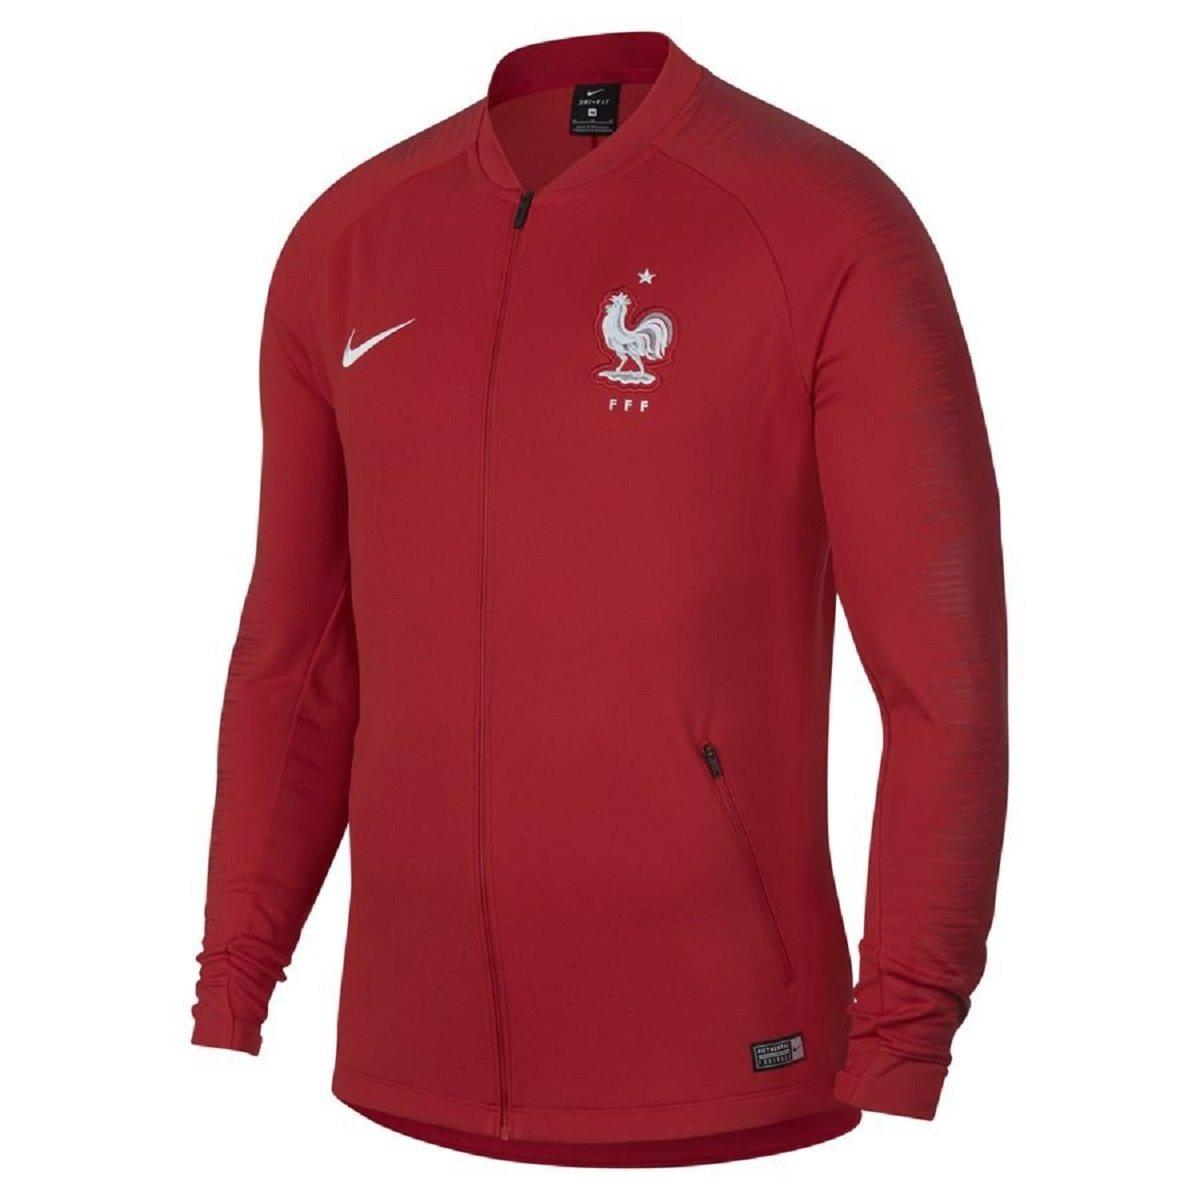 Nike 893590 – 661 Herren Jacke